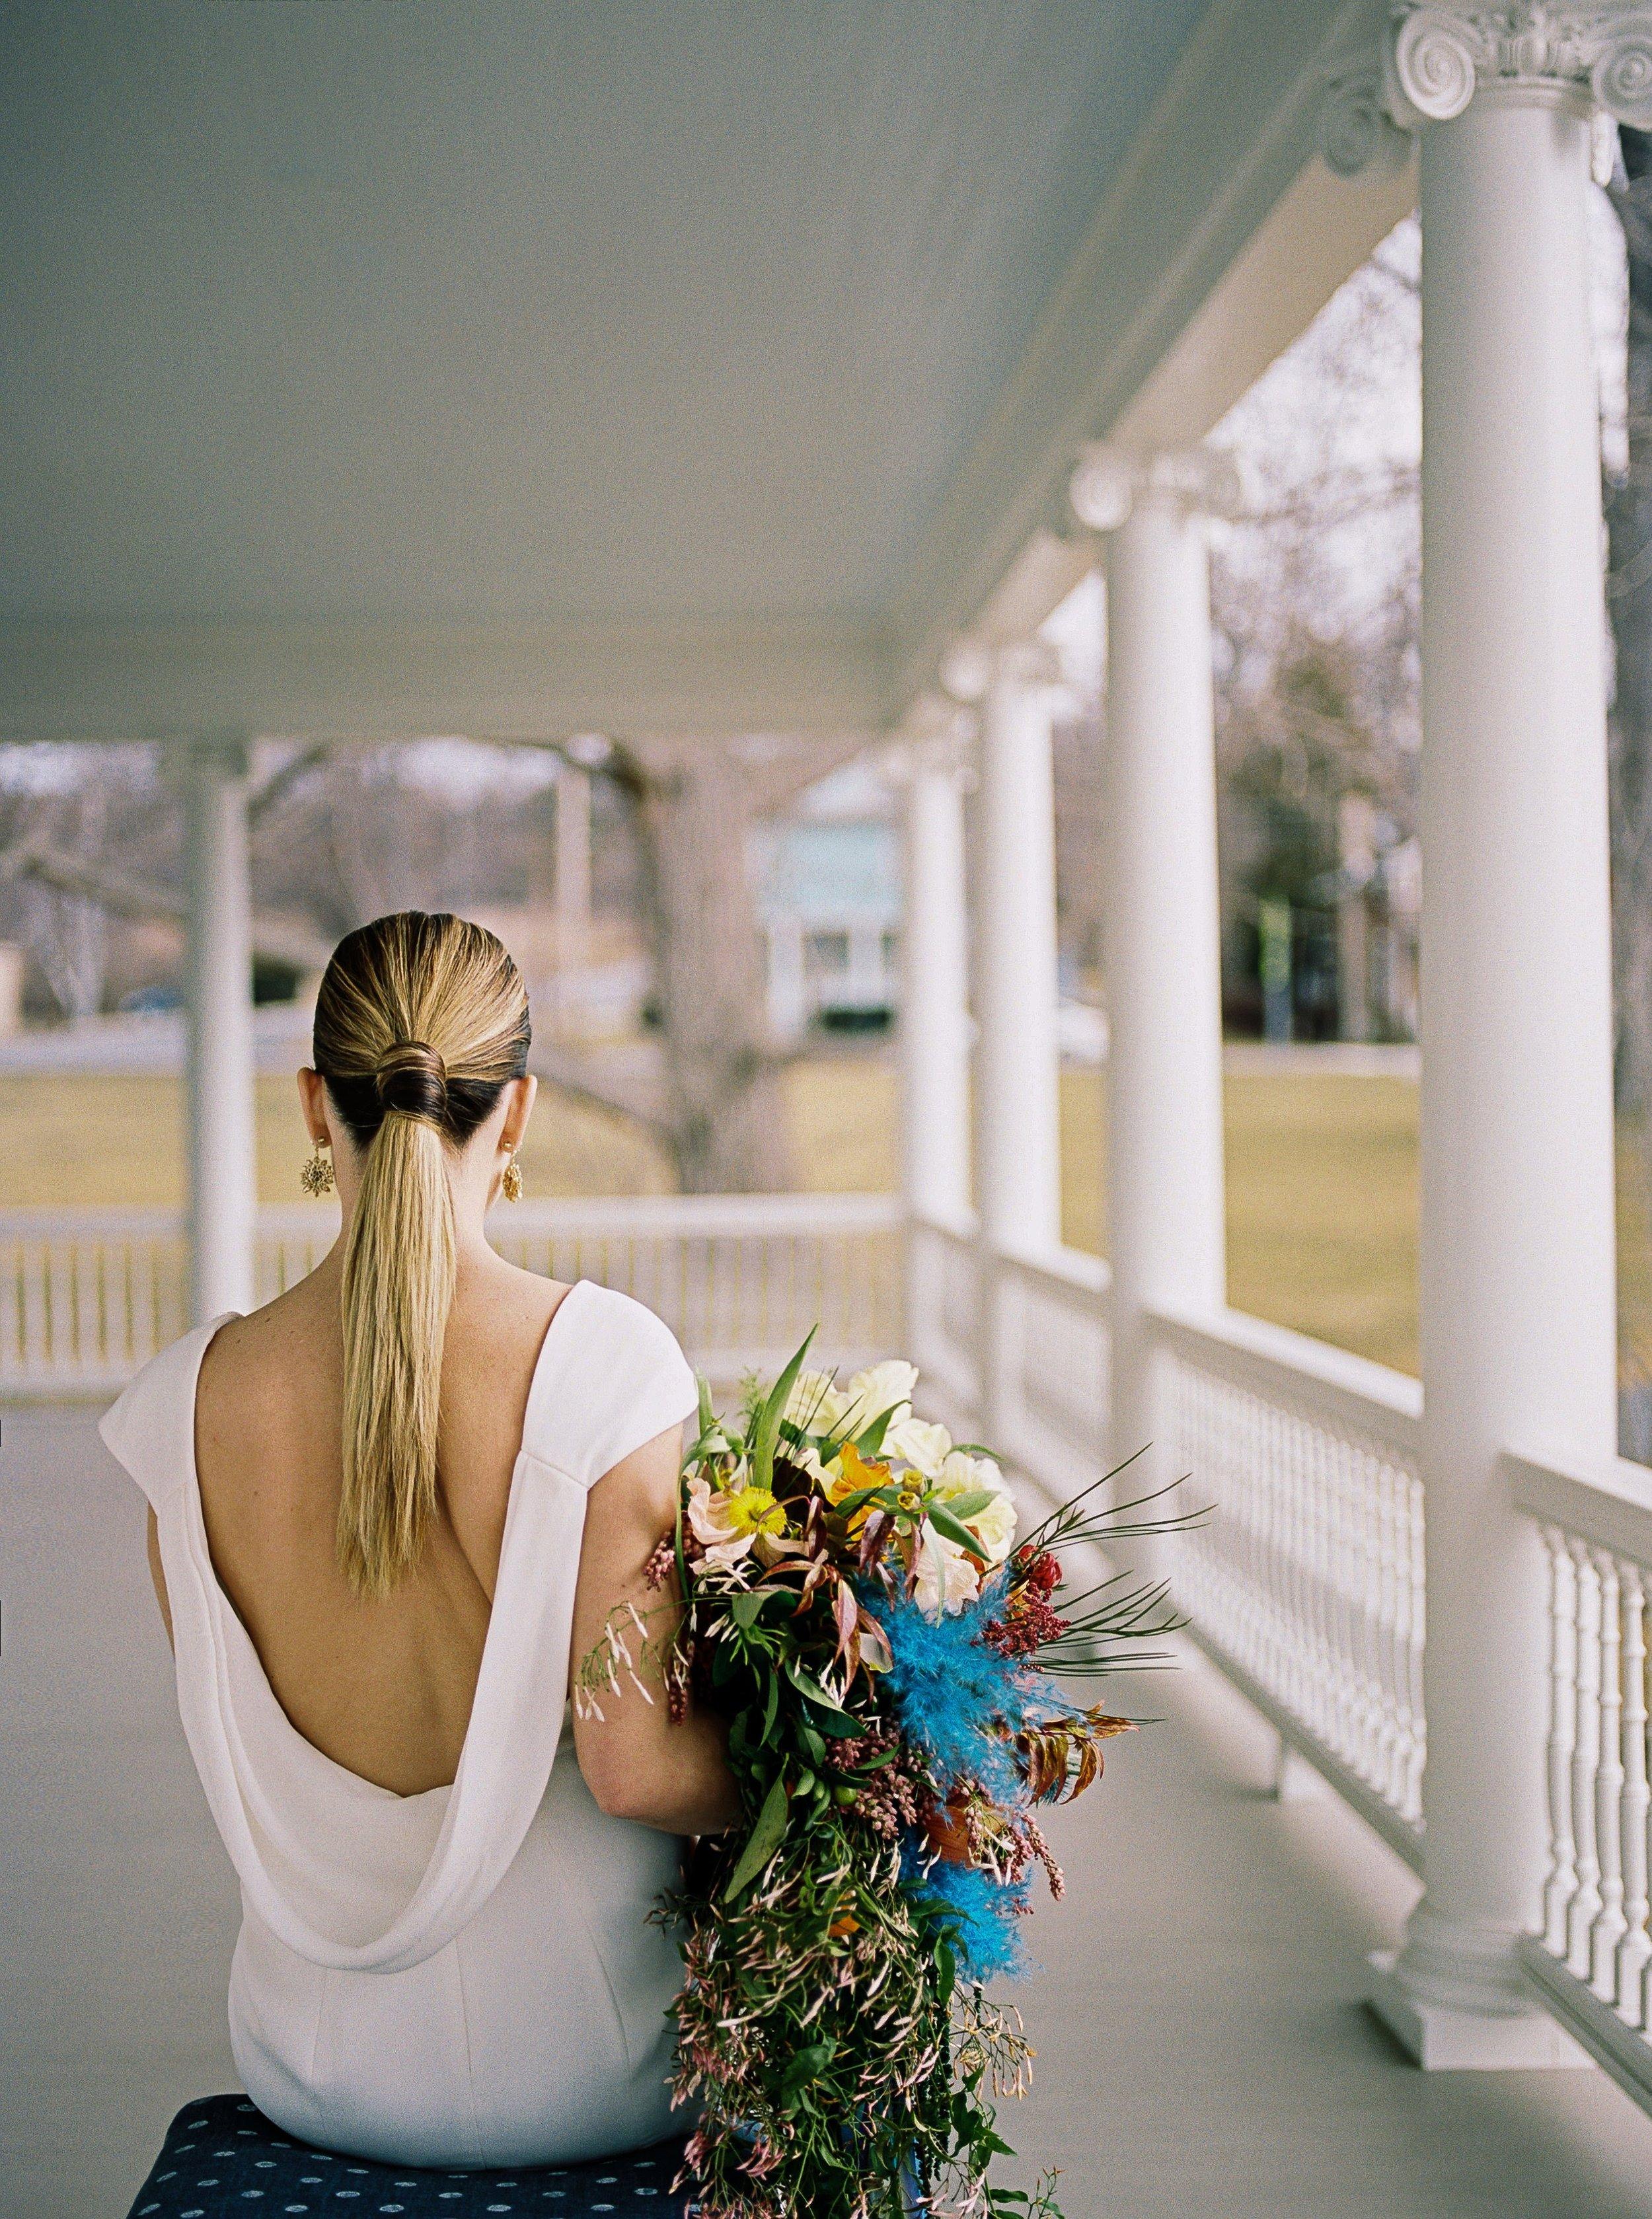 Alexandra-Elise-Photography-Ali-Reed-Rowland-House-Styled-Shoot-072.jpg